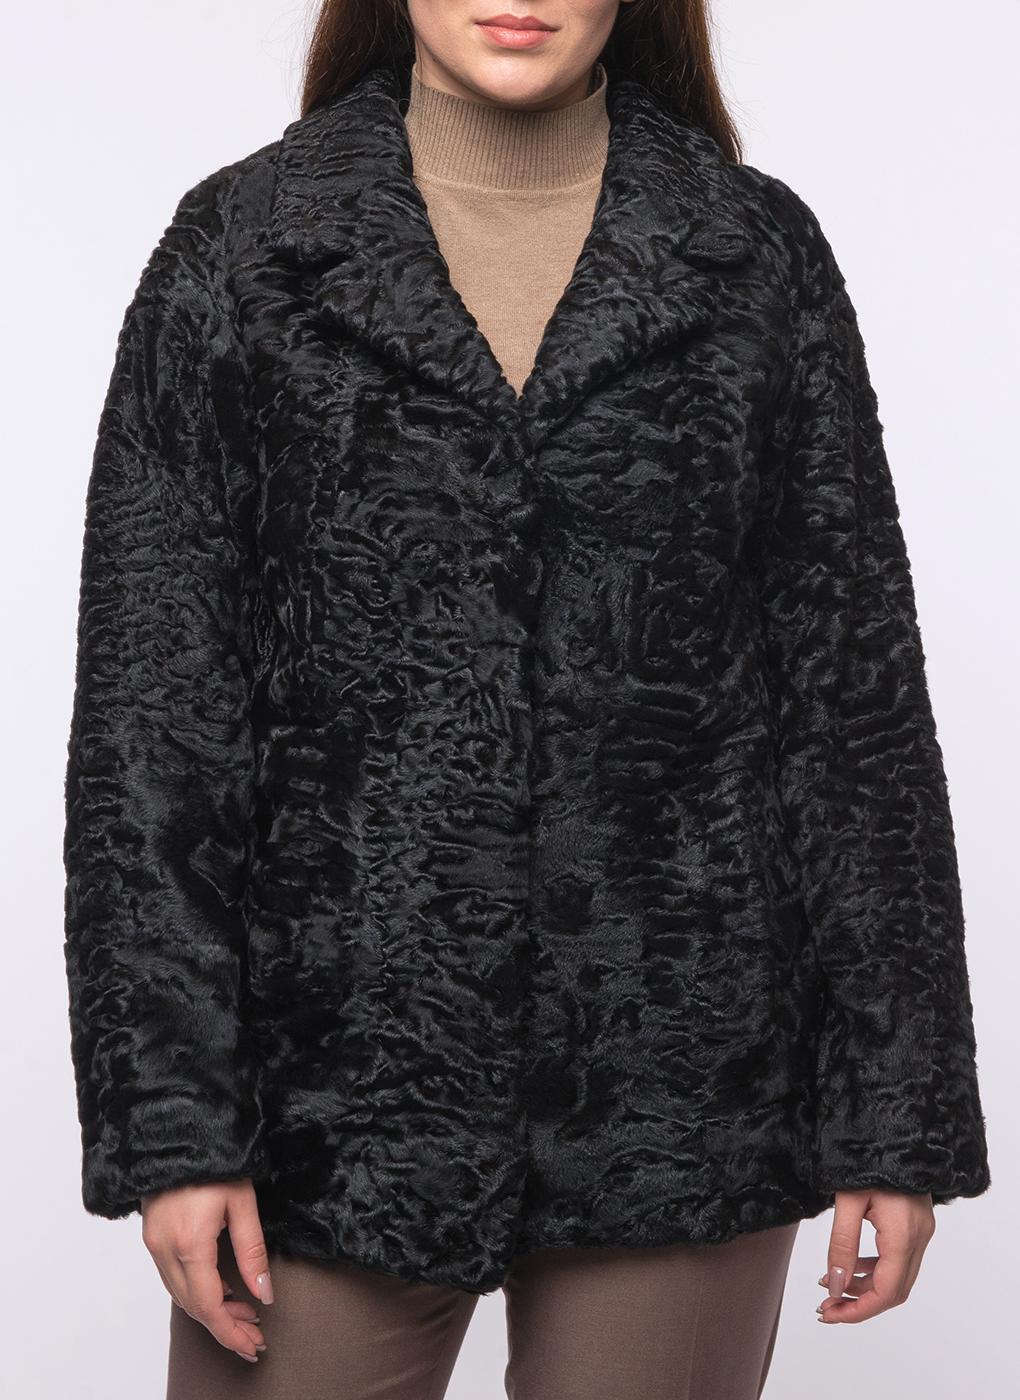 Куртка из каракуля Автоледи 03, Элина фото